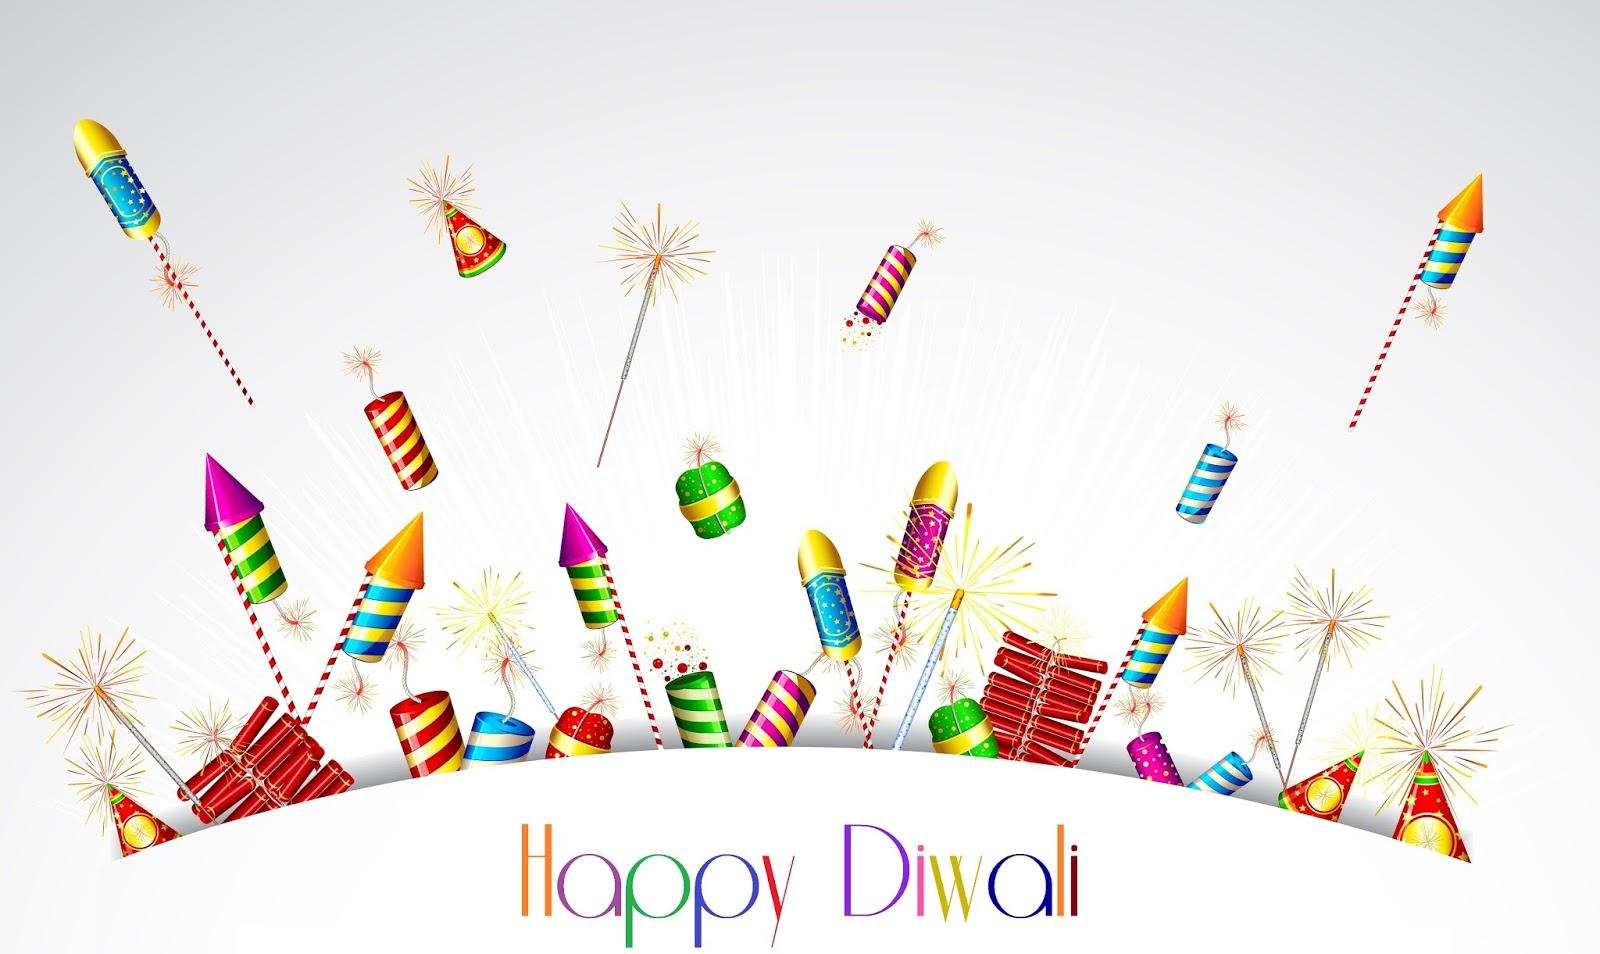 Fireworks clipart diwali cracker Works Diwali Fire Happy Diwali